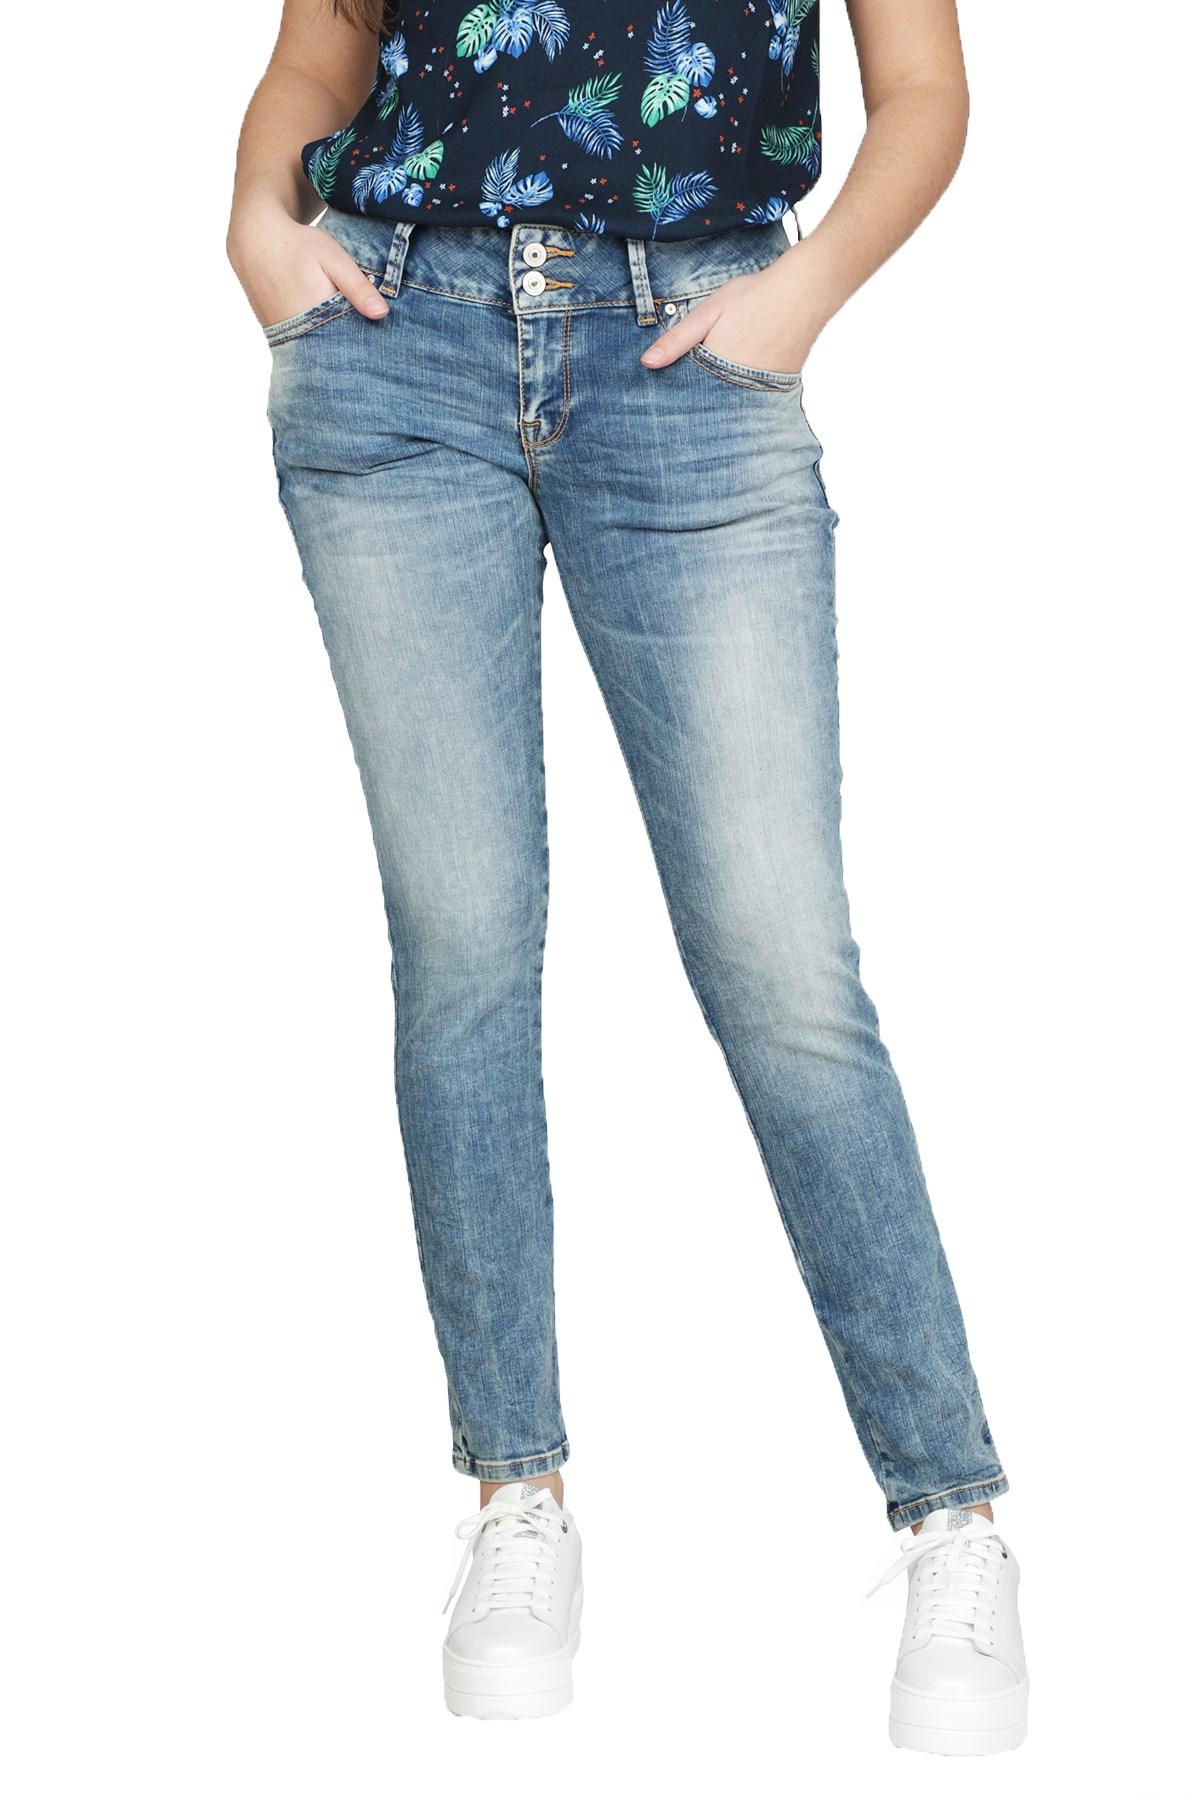 LTB Jeans Broek Blauw Molly Savannah wash